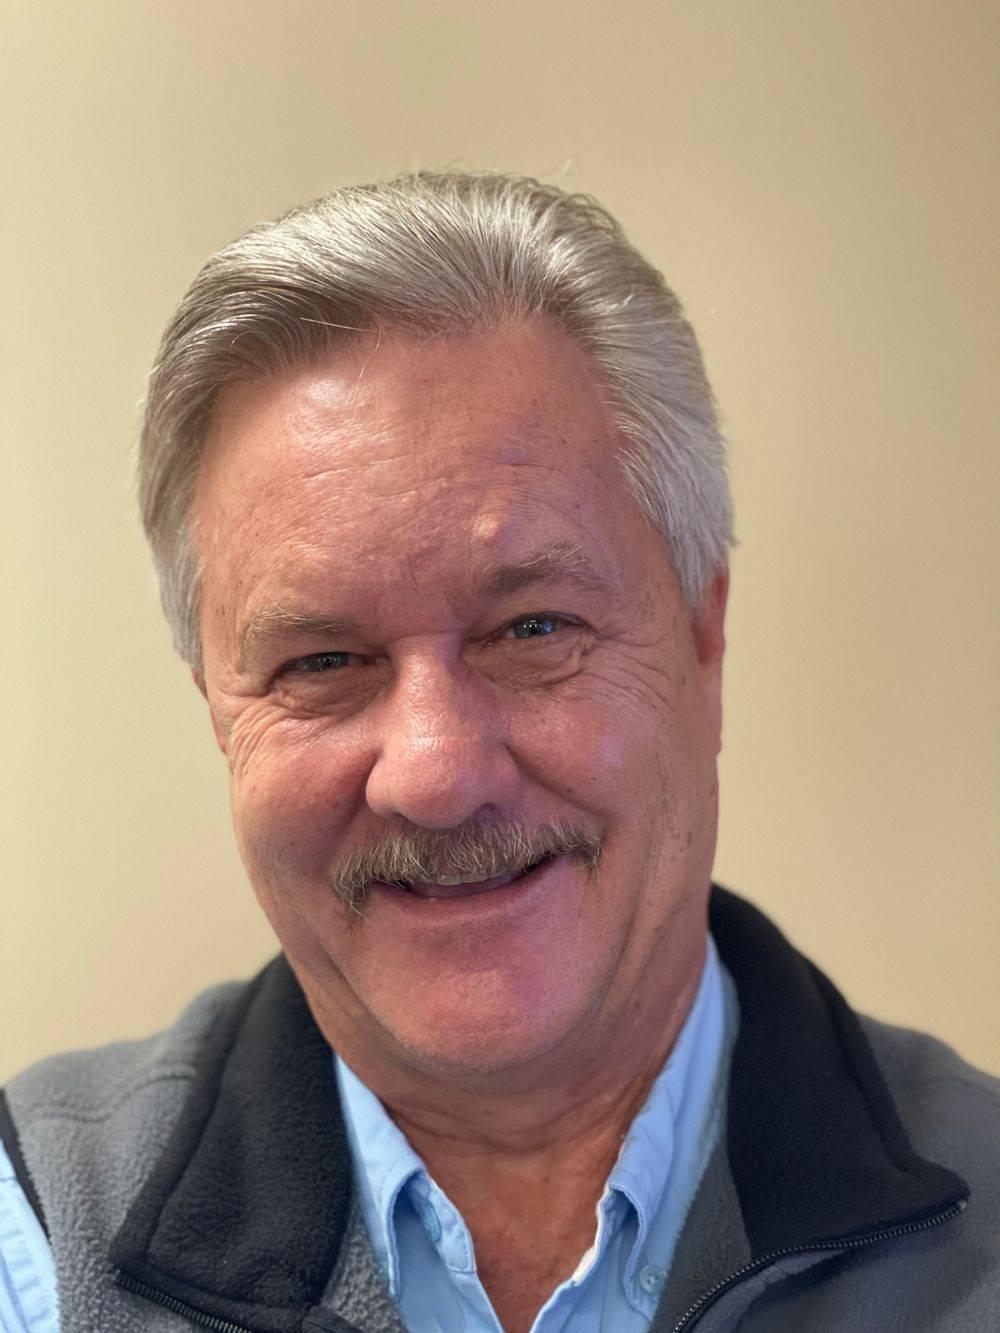 Joe Walton is the President of Glenhaven Snow Company, LLC